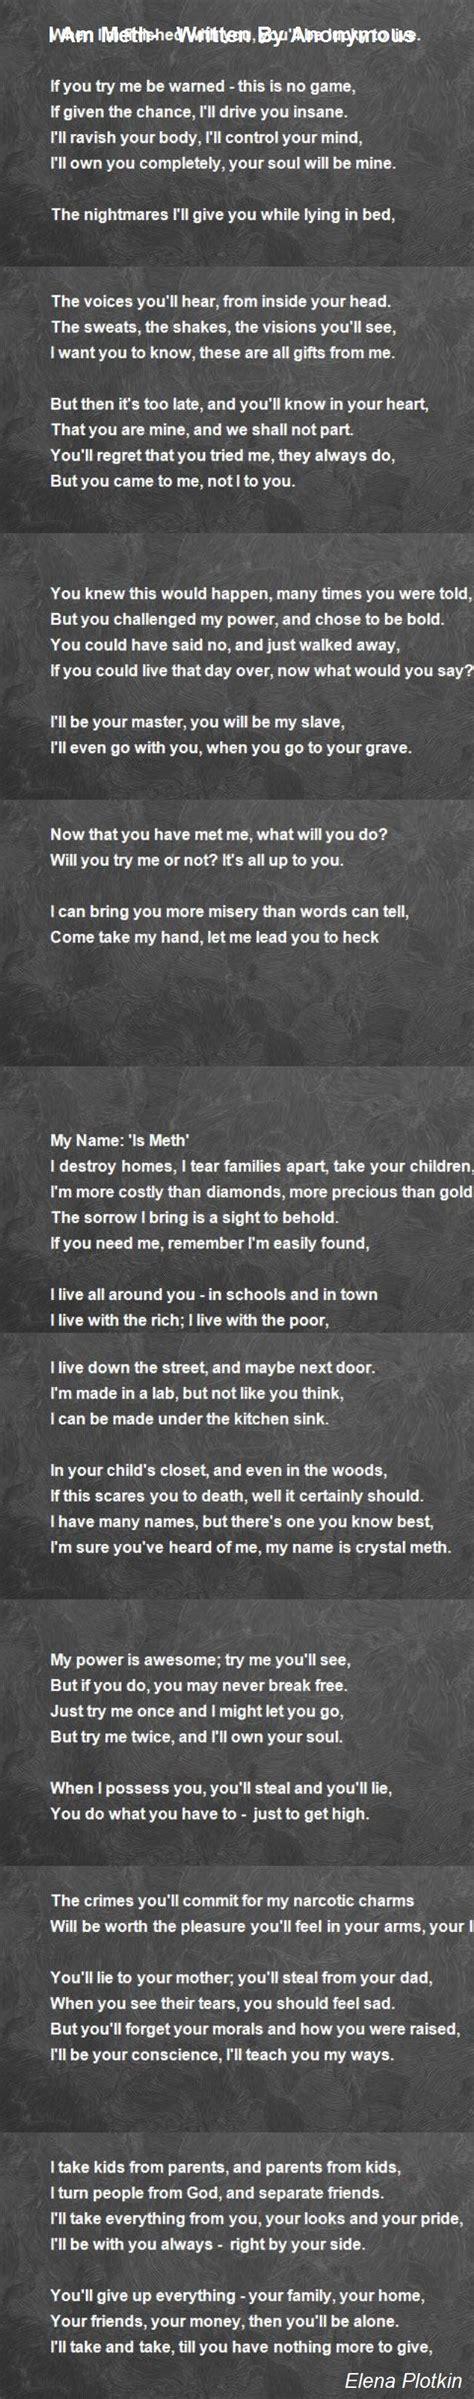 meth written  anonymous poem  elena plotkin